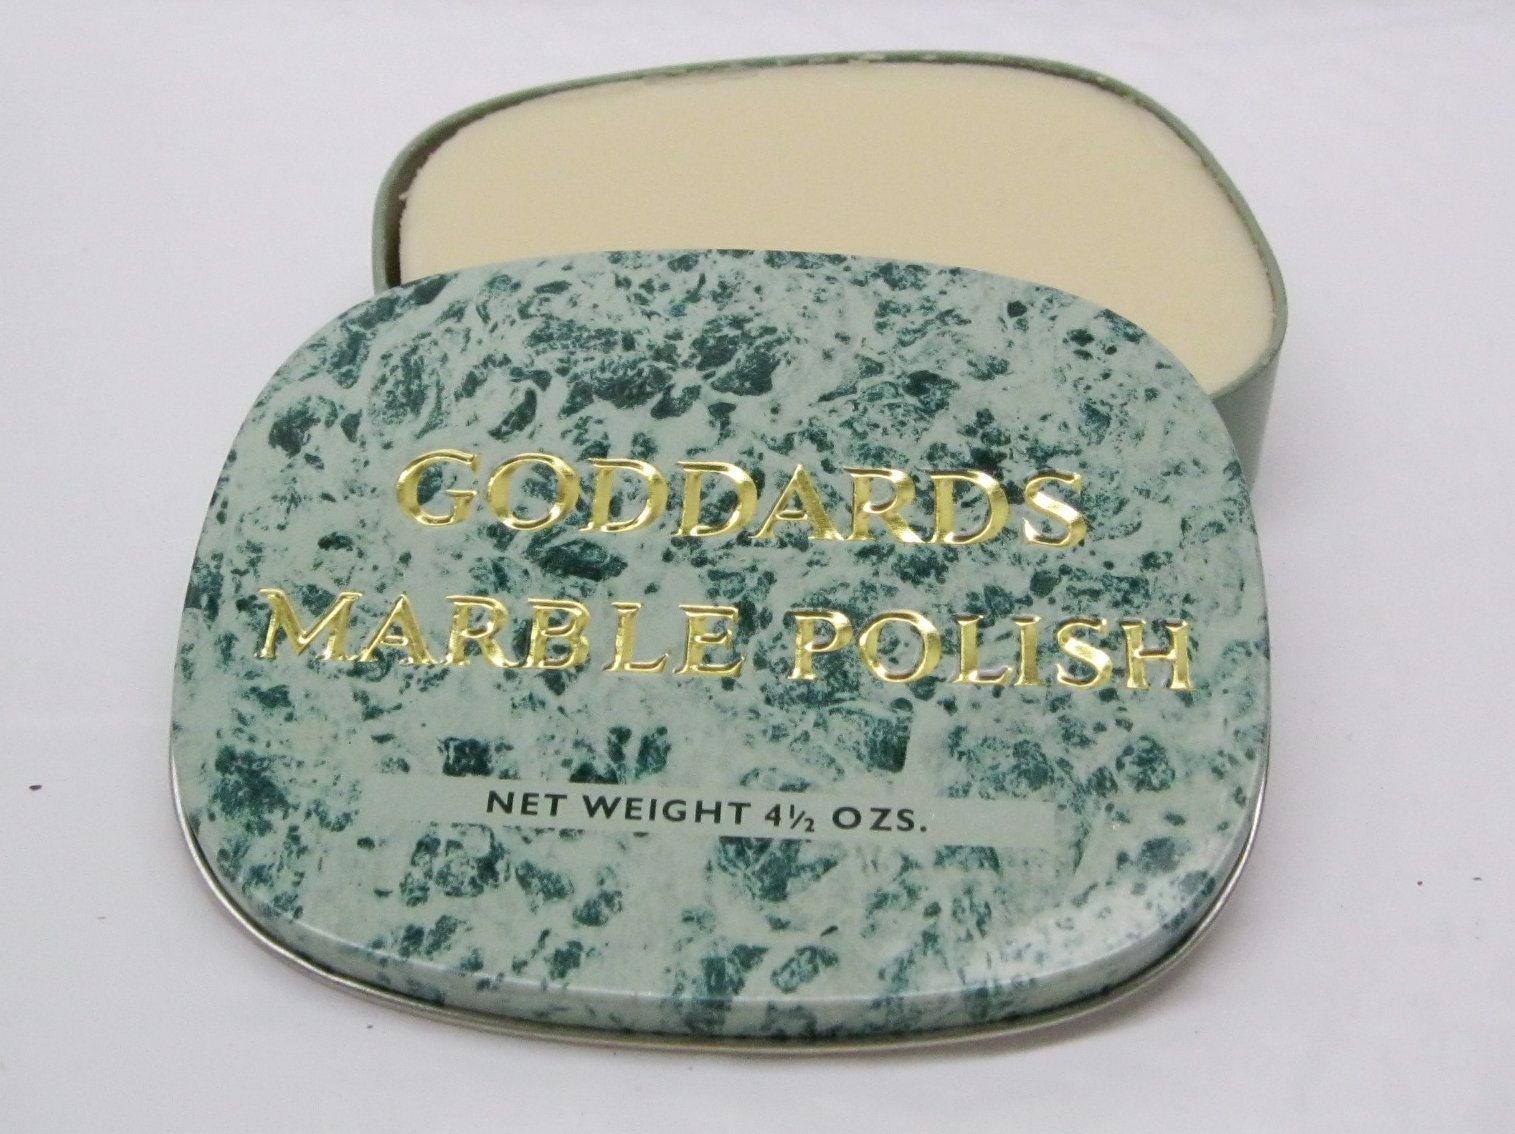 Goddard Marble Polish